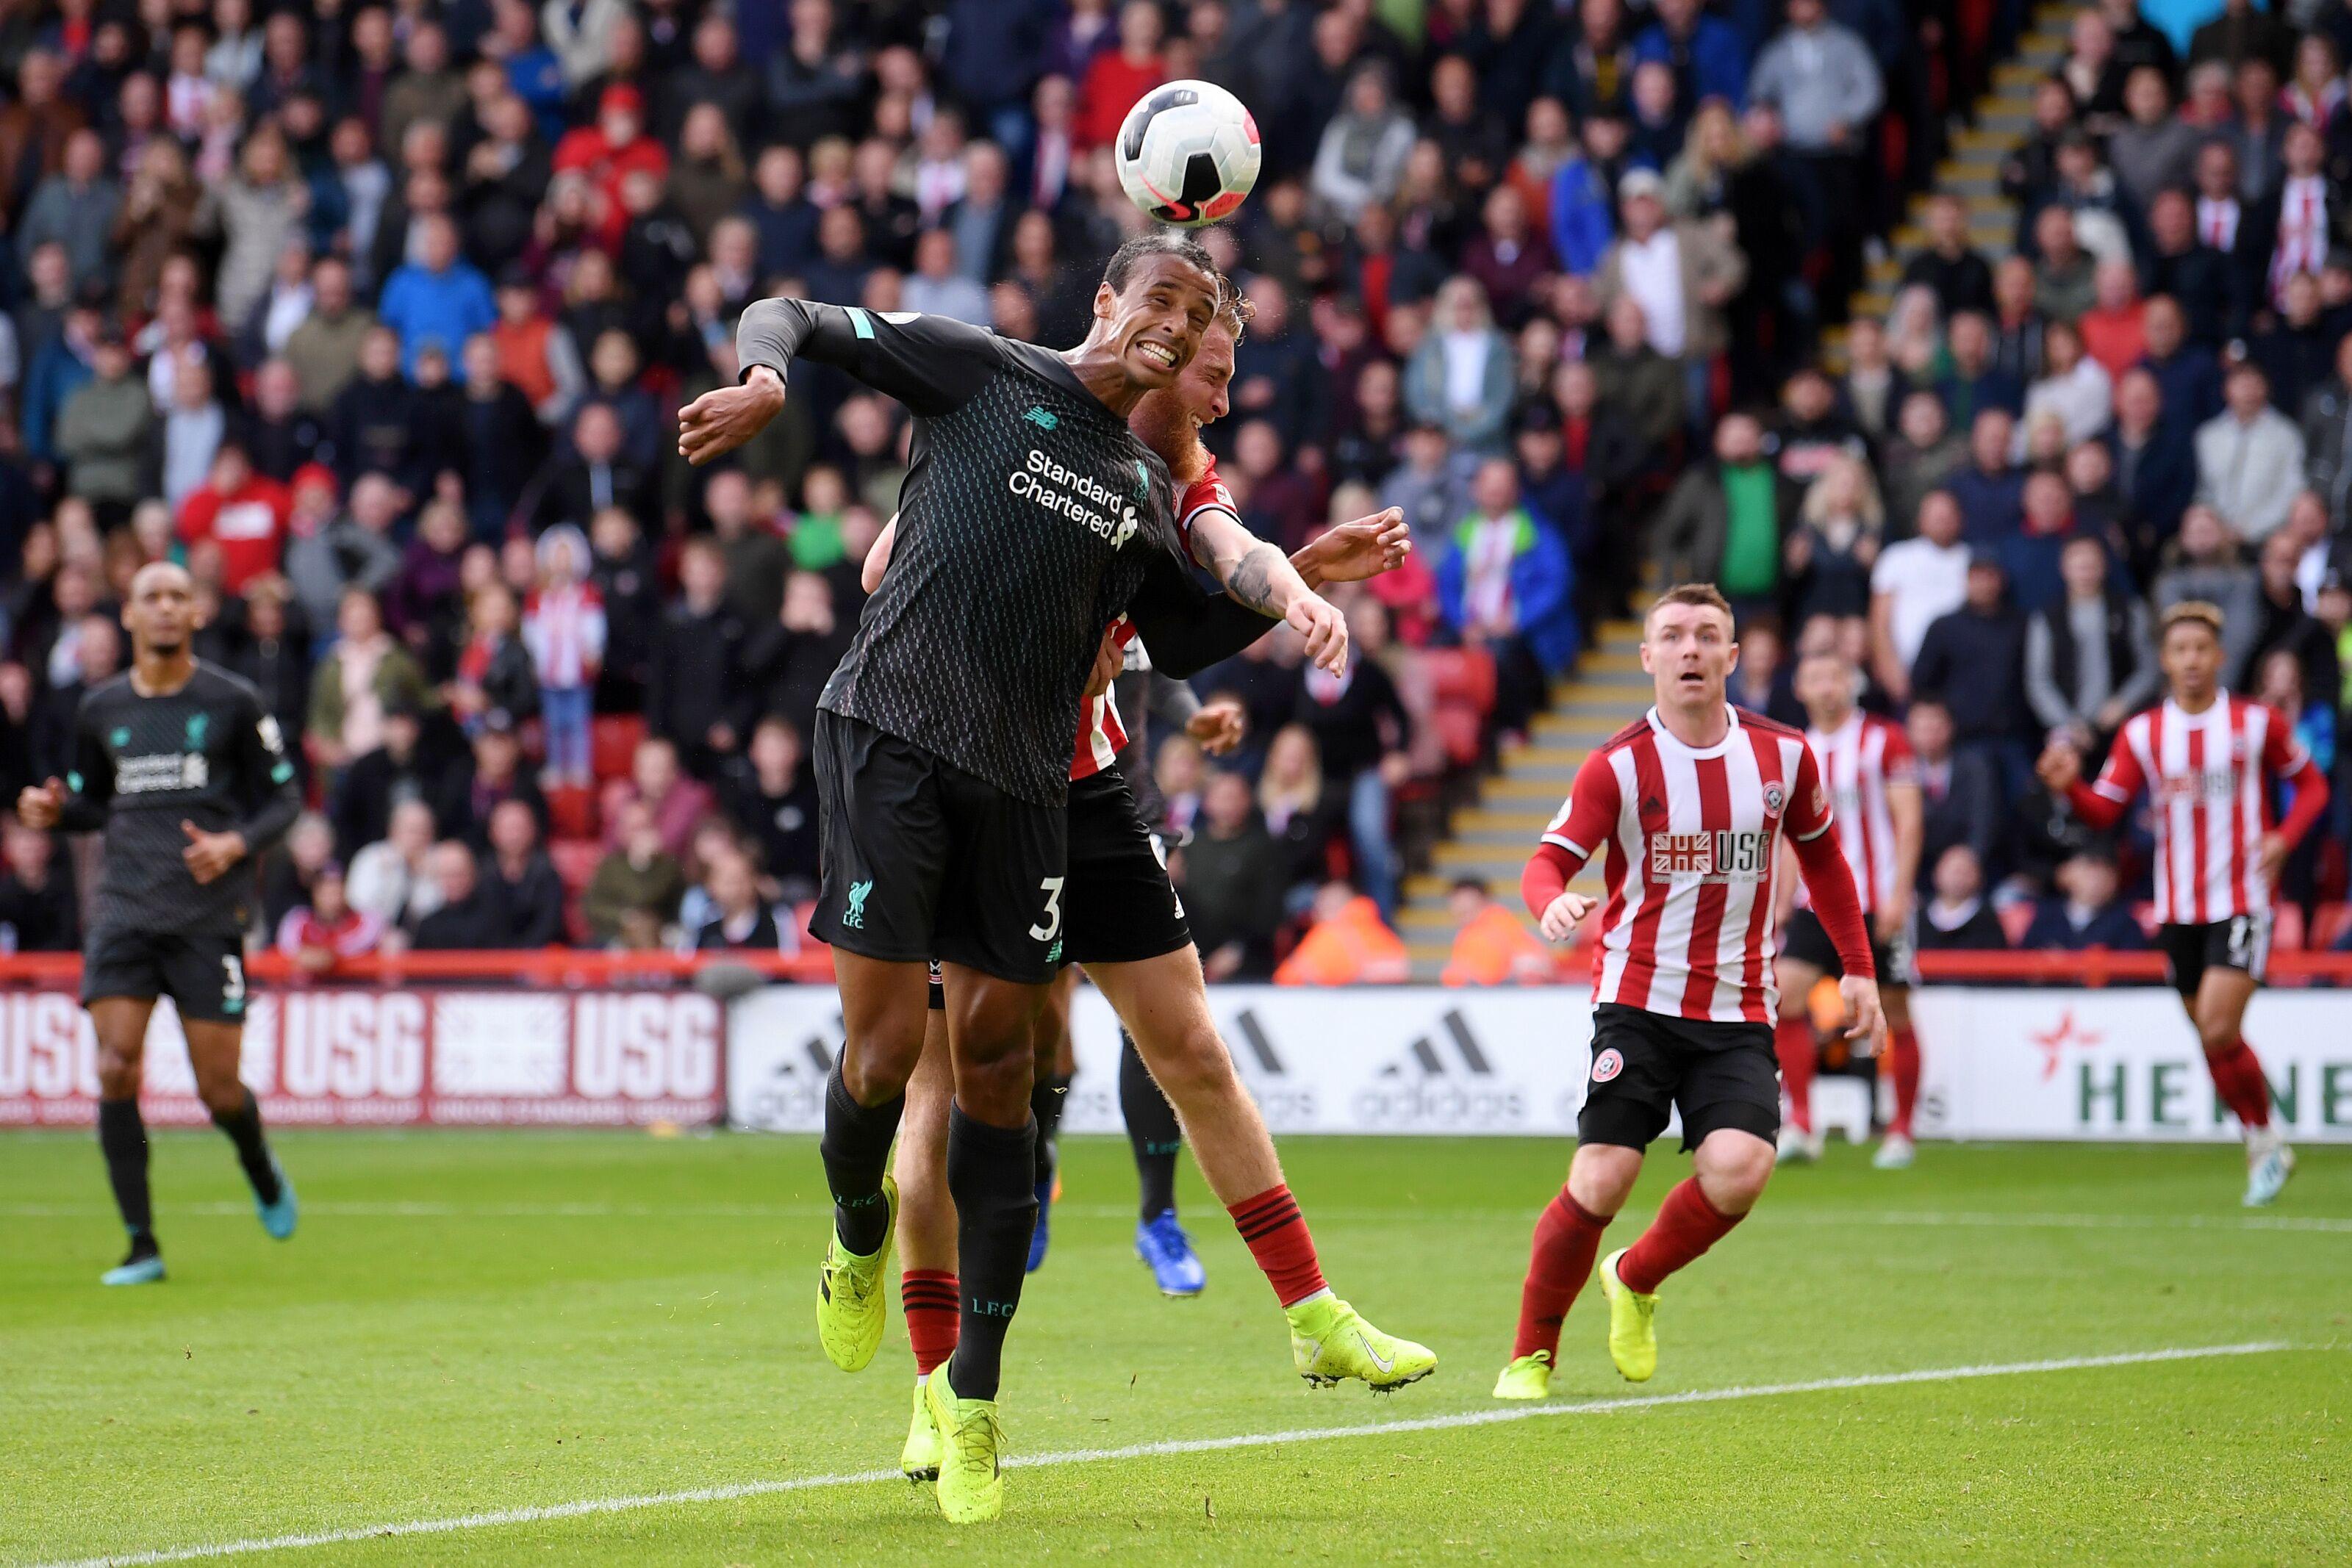 Liverpool vs Man Utd: Refreshed Joel Matip will stop stuttering Juan Mata